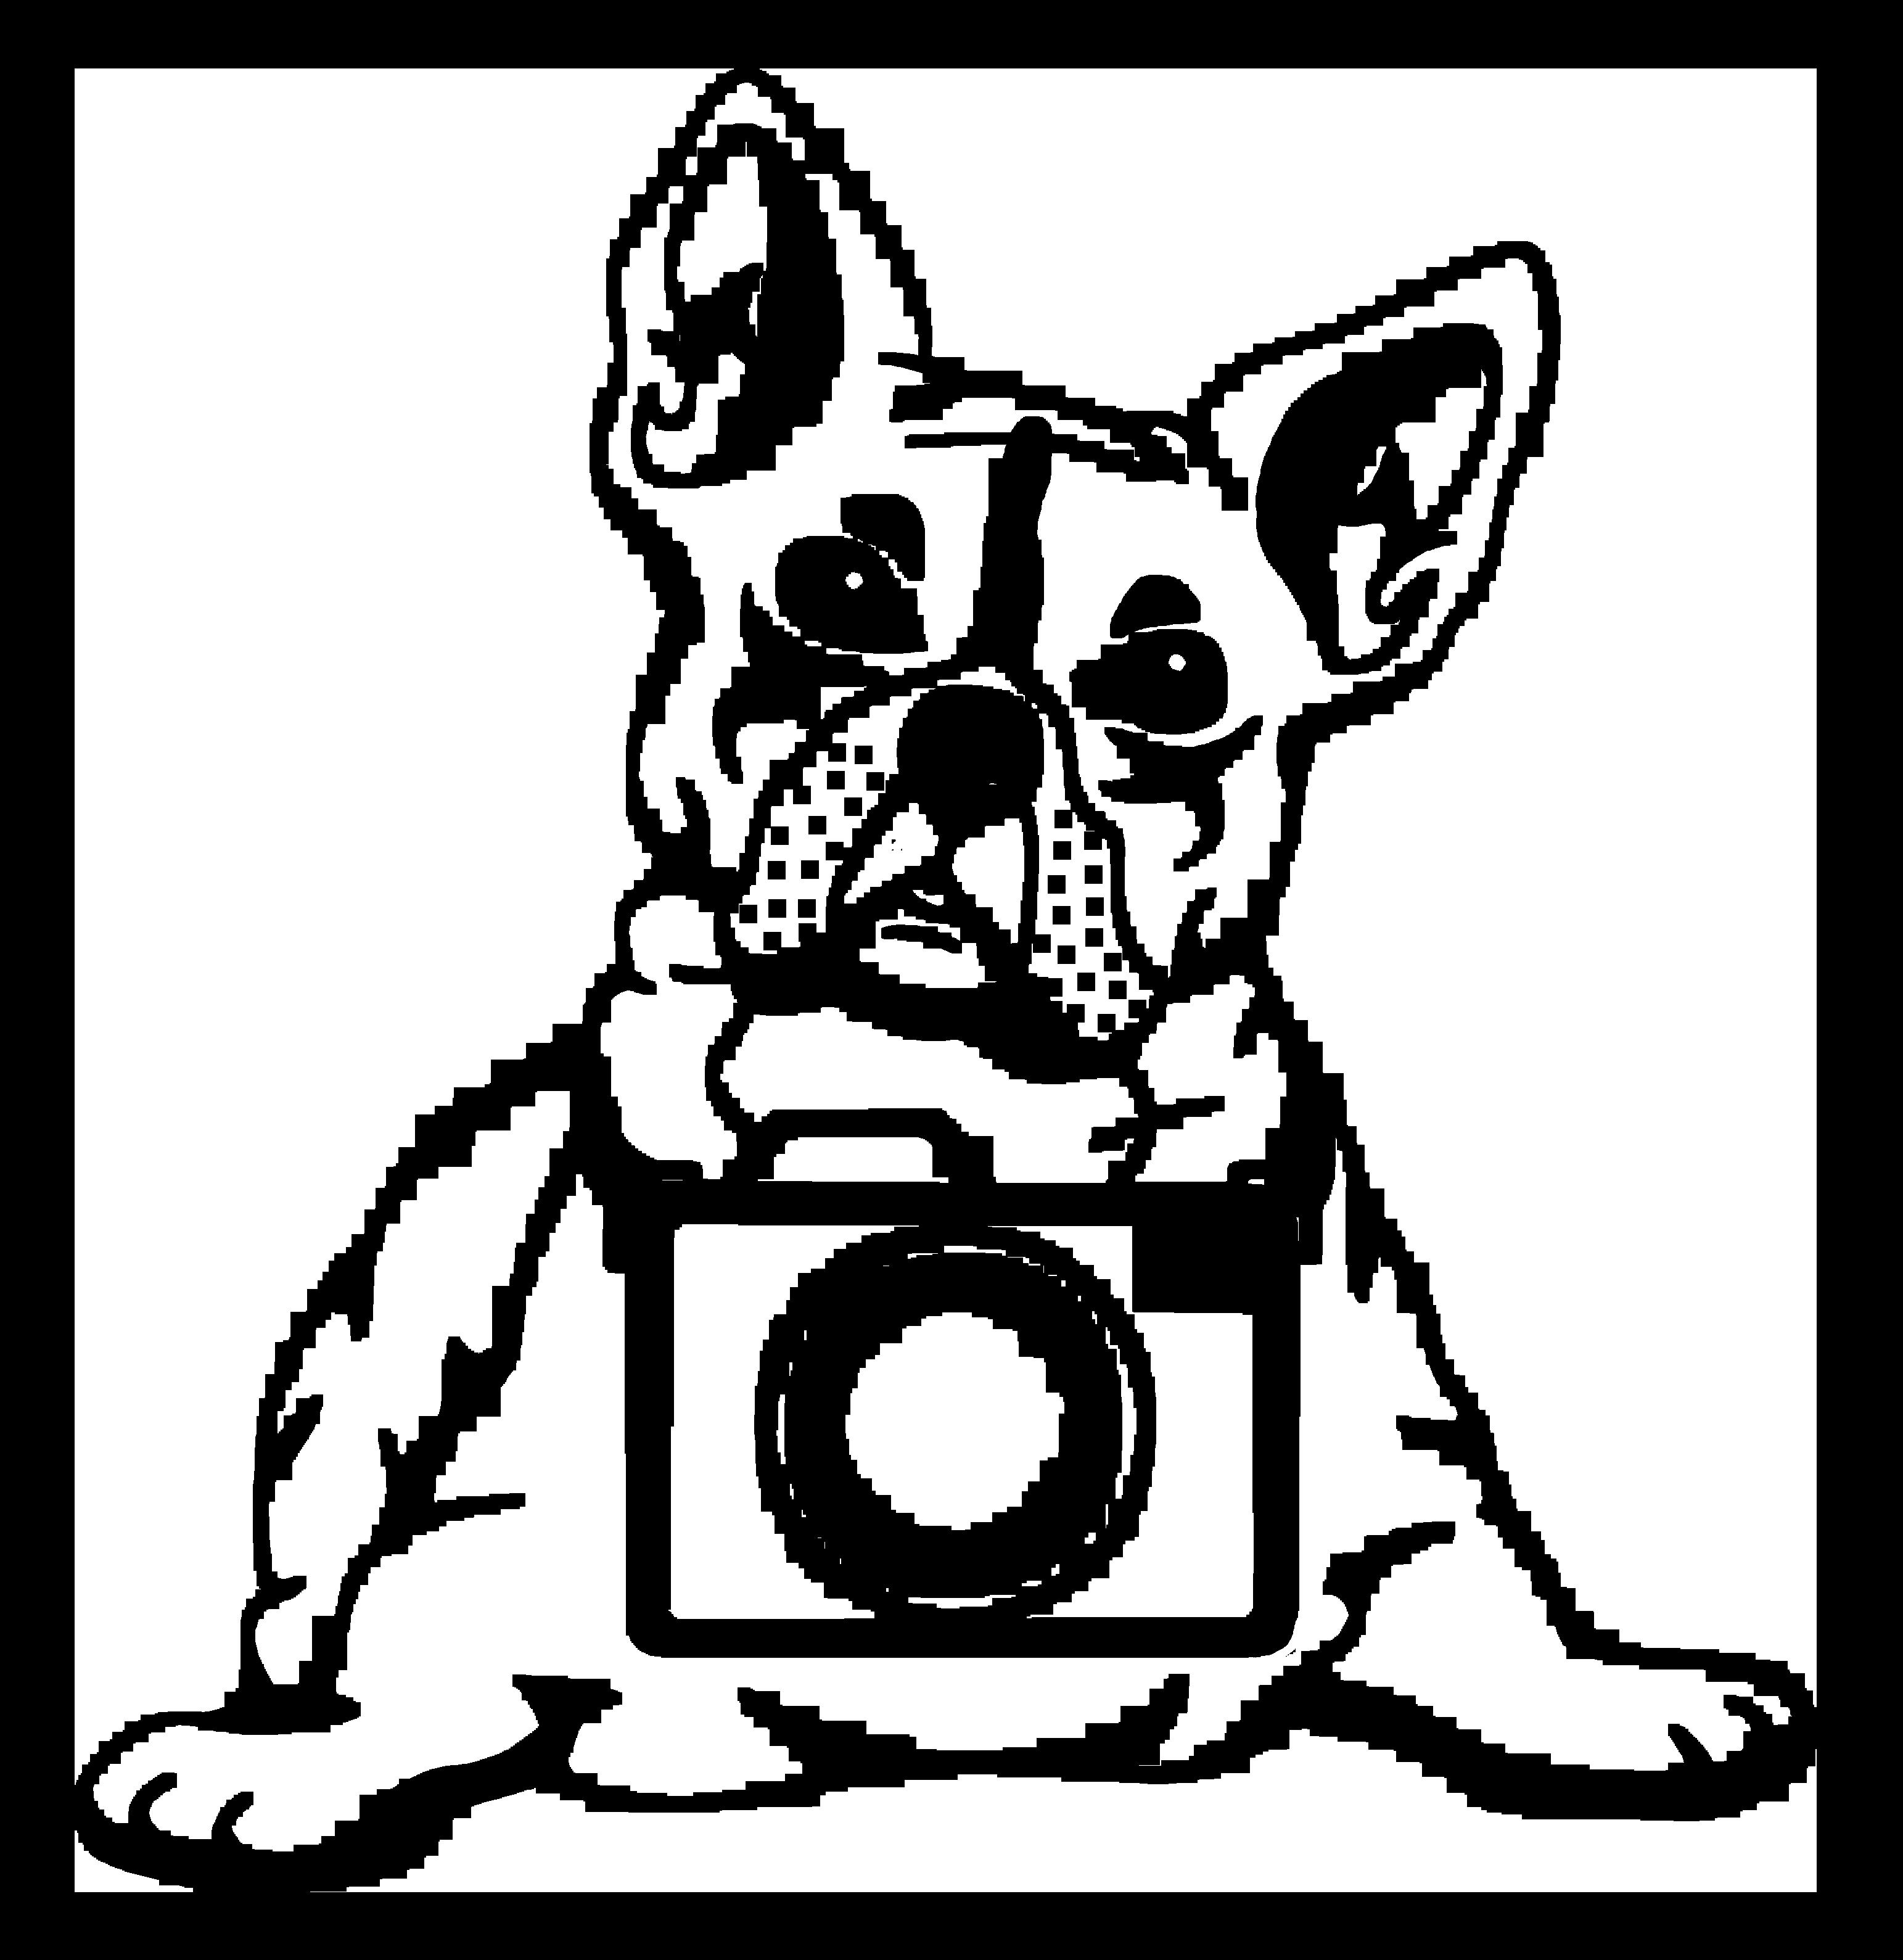 Nose Clipart Diagram Nose Diagram Transparent Free For Manual Guide